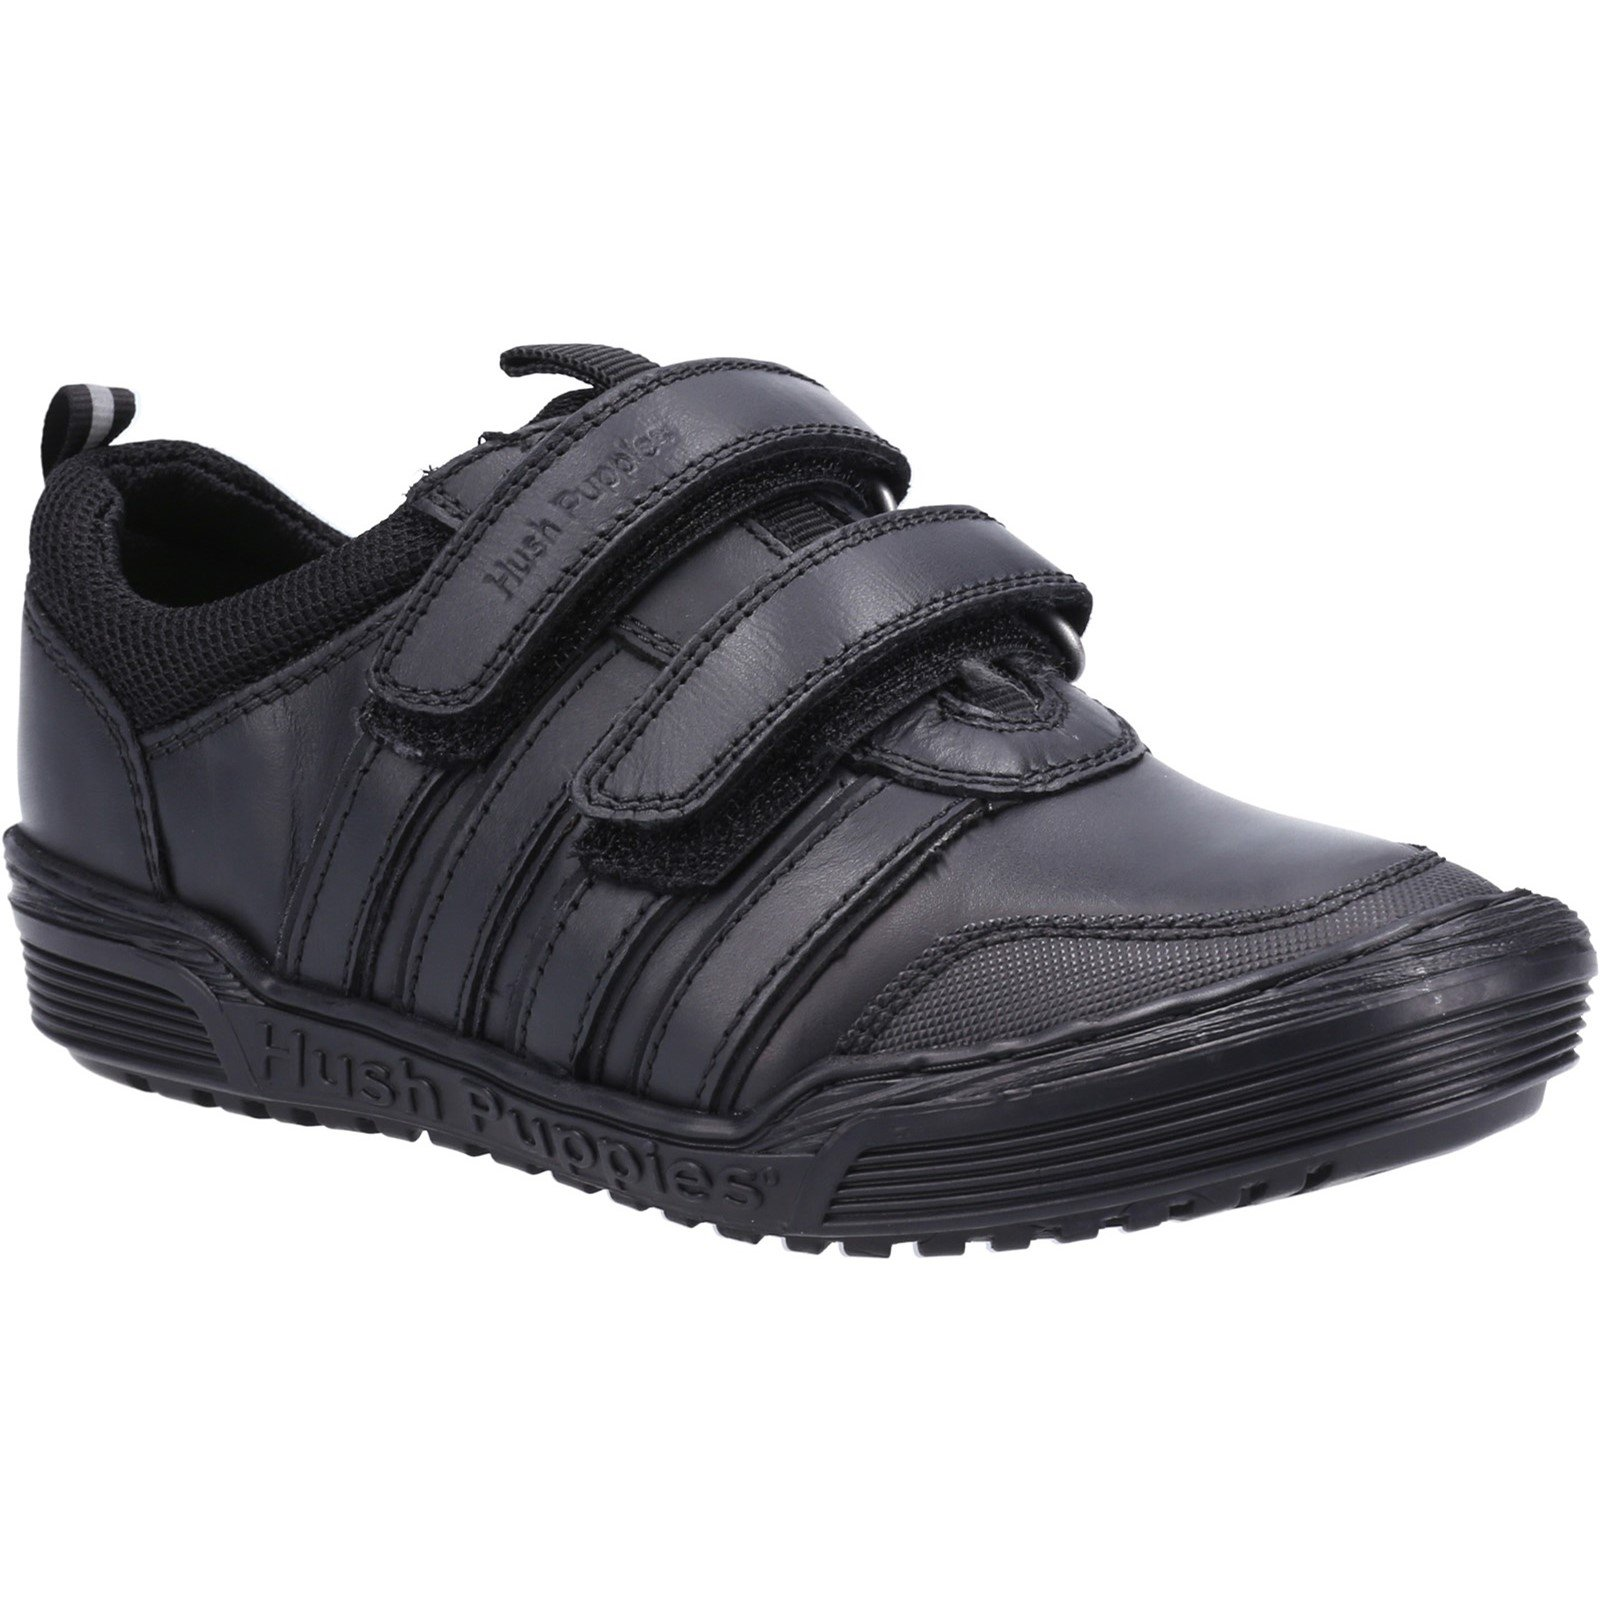 Hush Puppies Kid's Jake School Shoe Black 32736 - Black 1